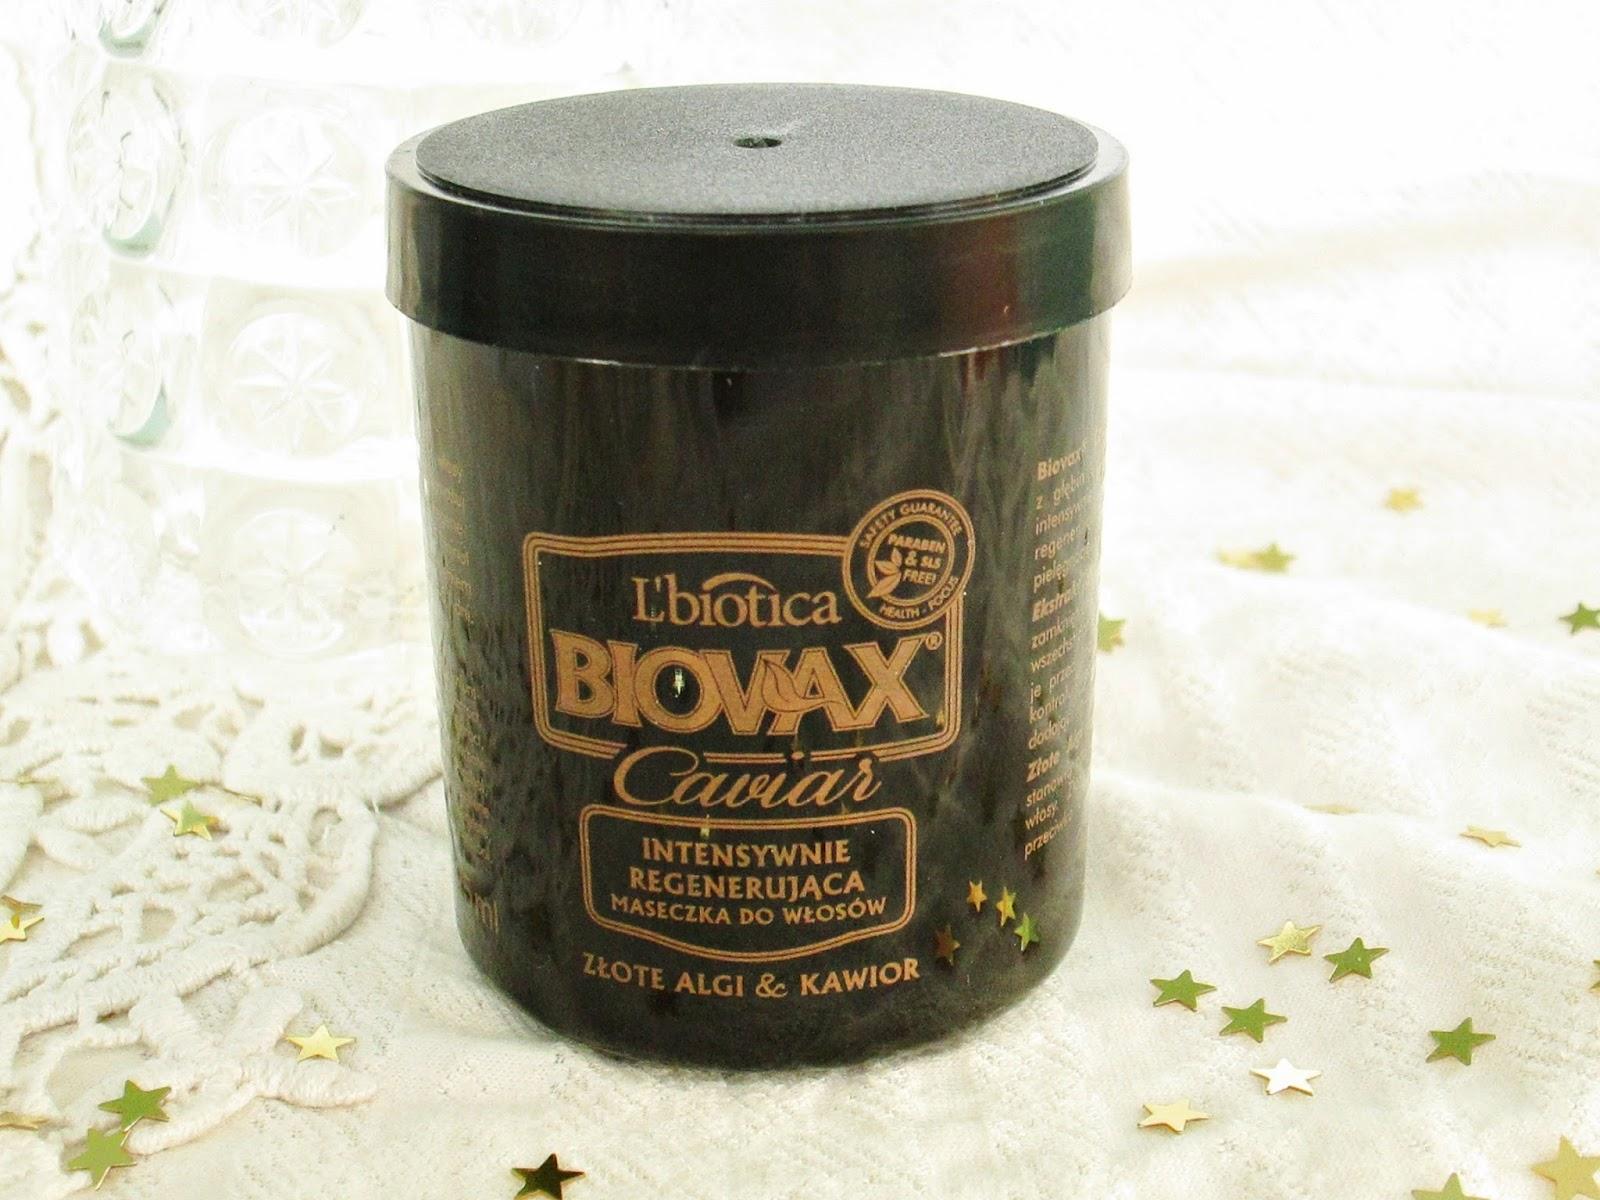 maska Biovax Caviar Kawior i Złote Algi